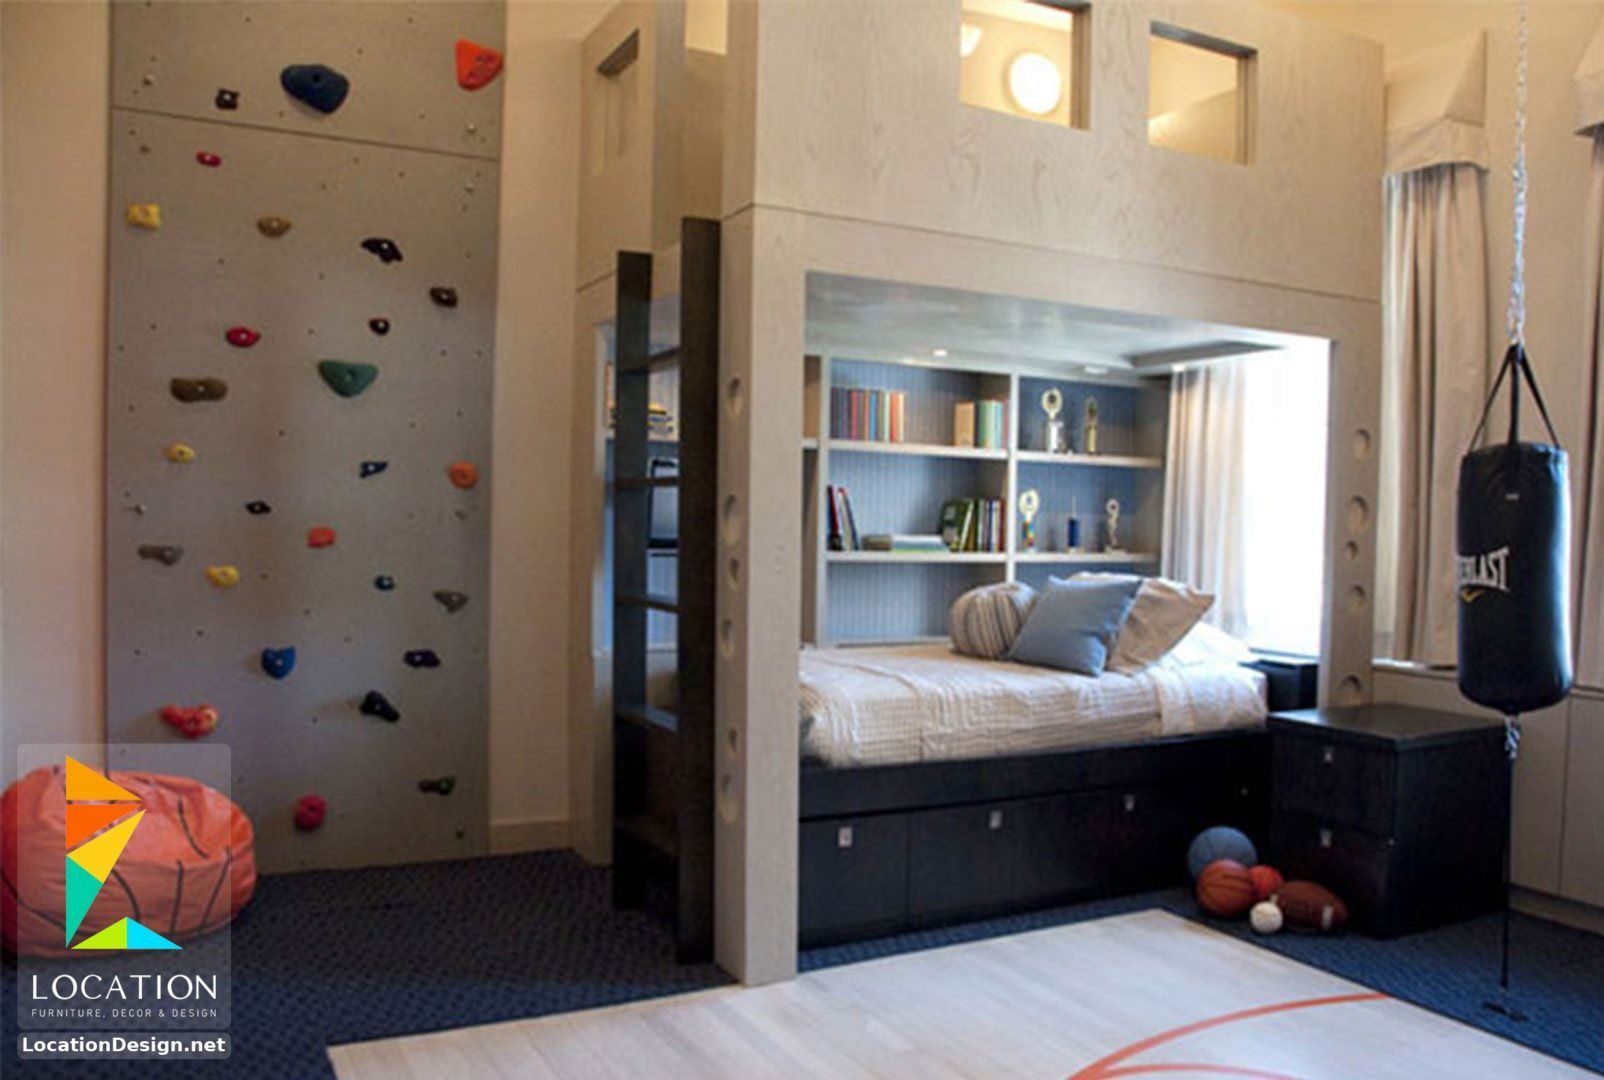 غرف نوم اولاد شباب أحدث موديلات غرف شبابي مودرن لوكشين ديزين نت Boys Room Design Boys Dorm Room Kids Room Design